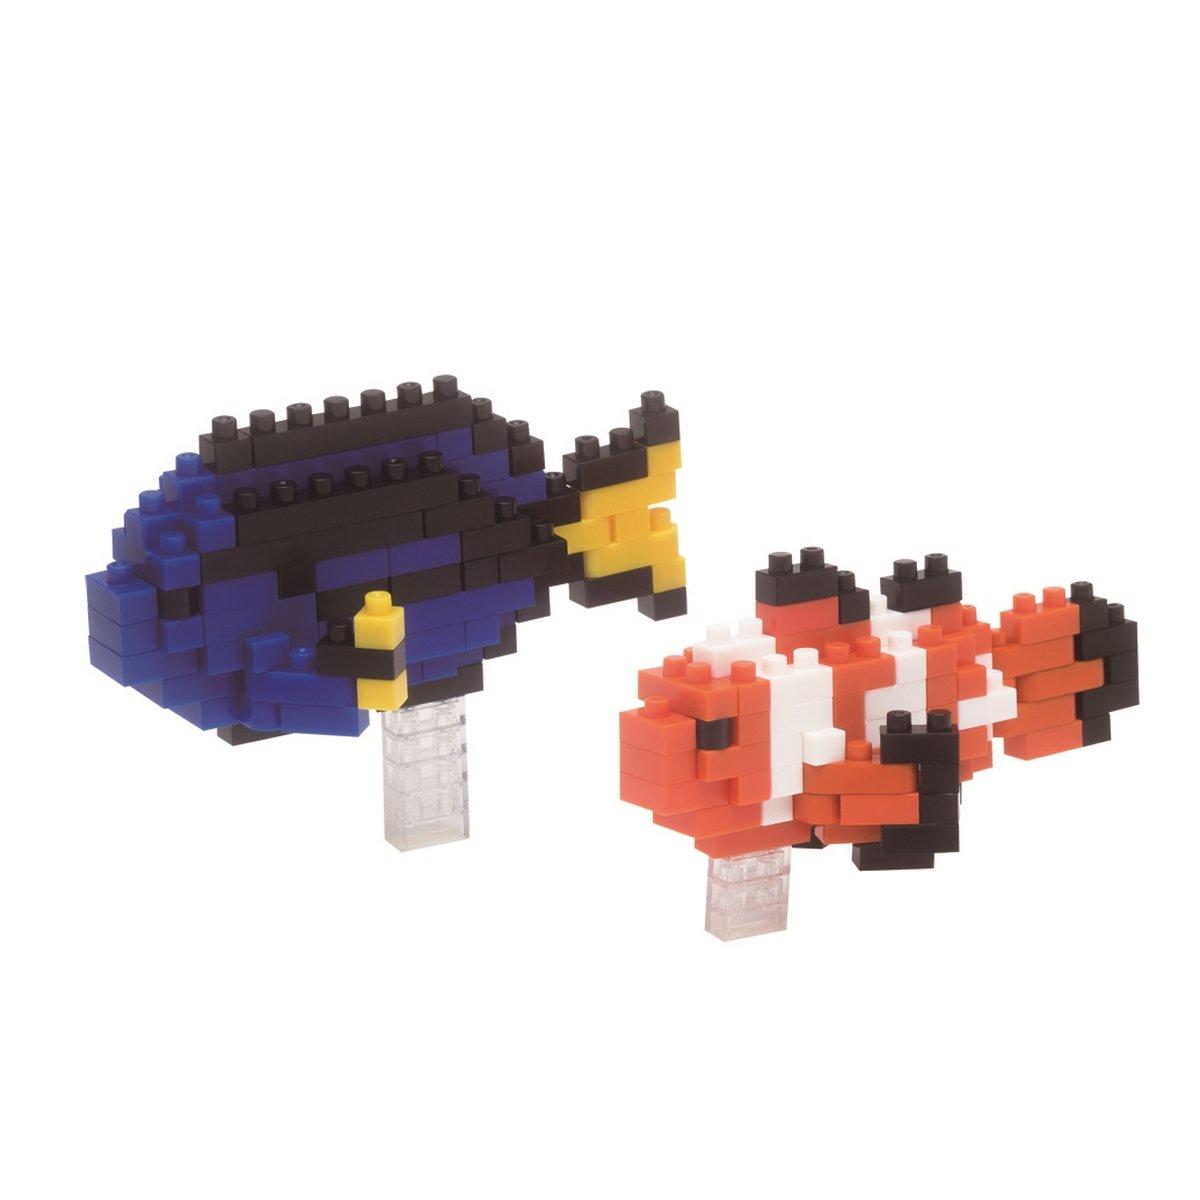 Nanoblock NAN-NBC118 Clown Fish/Palette Surgeon Fish, Juguete de construcción